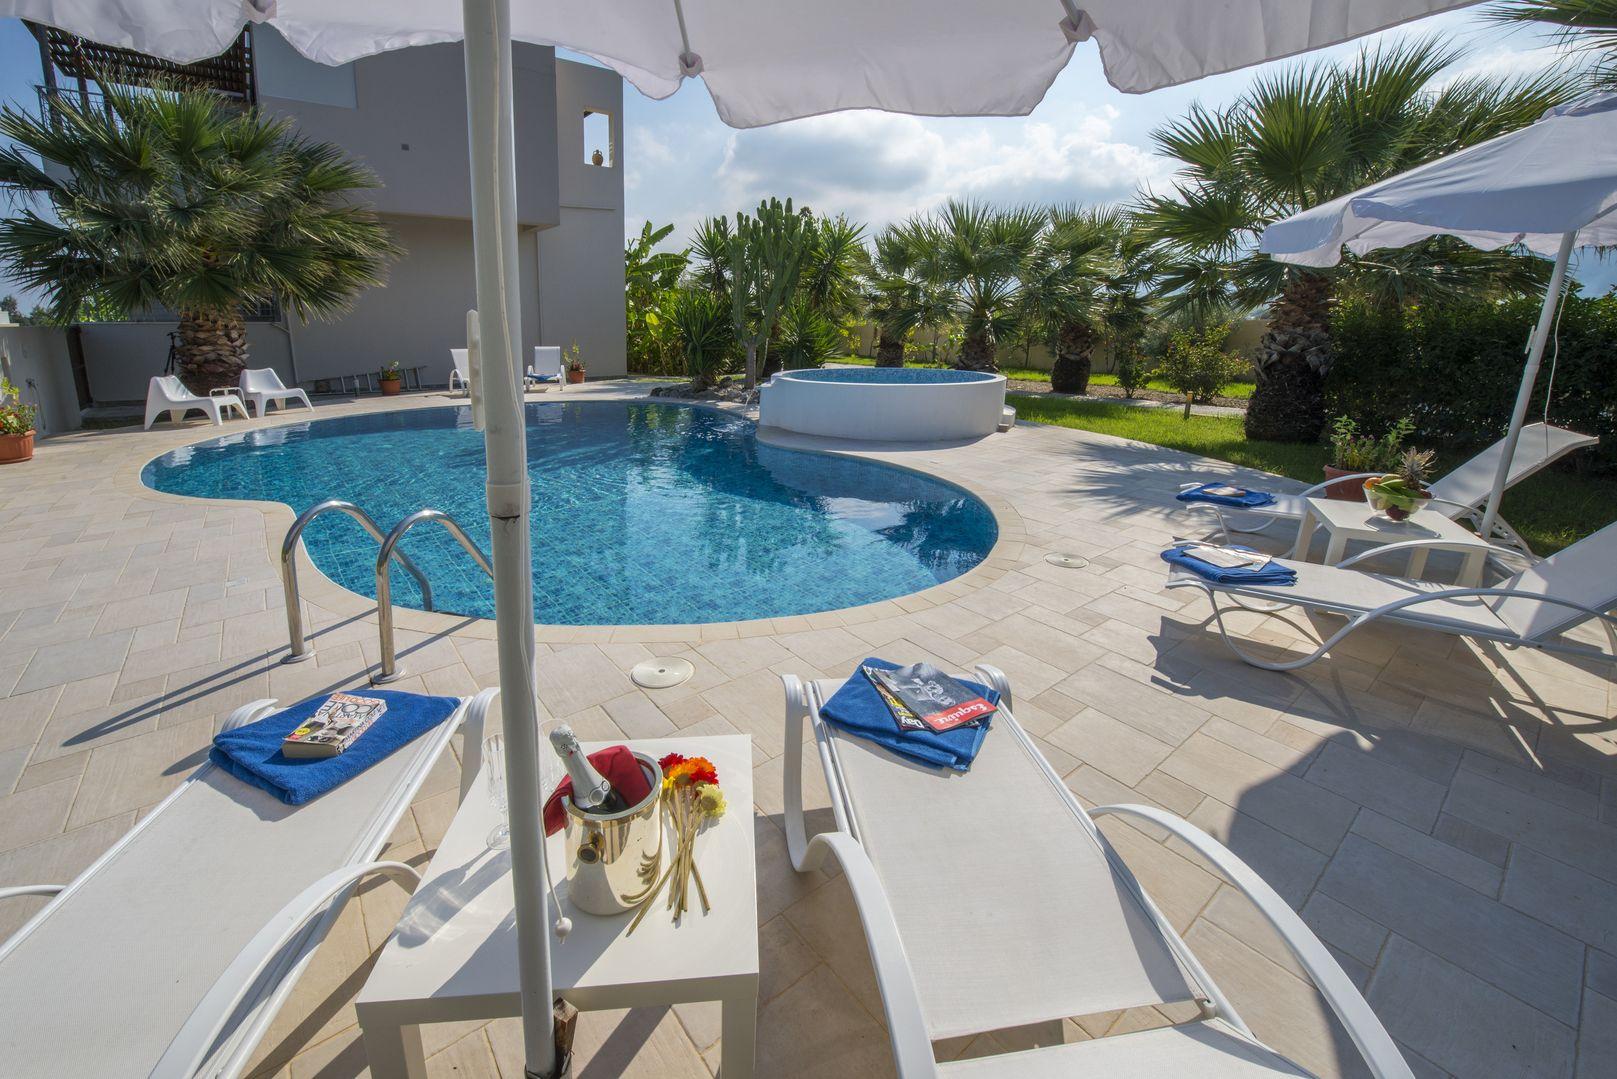 Holiday house Xenos Villa 2 Mit 4 Schlafzimmern, privatem Pool, in der Nhe des Meeres in Tigaki (2646103), Kos, Kos, Dodecanes Islands, Greece, picture 1